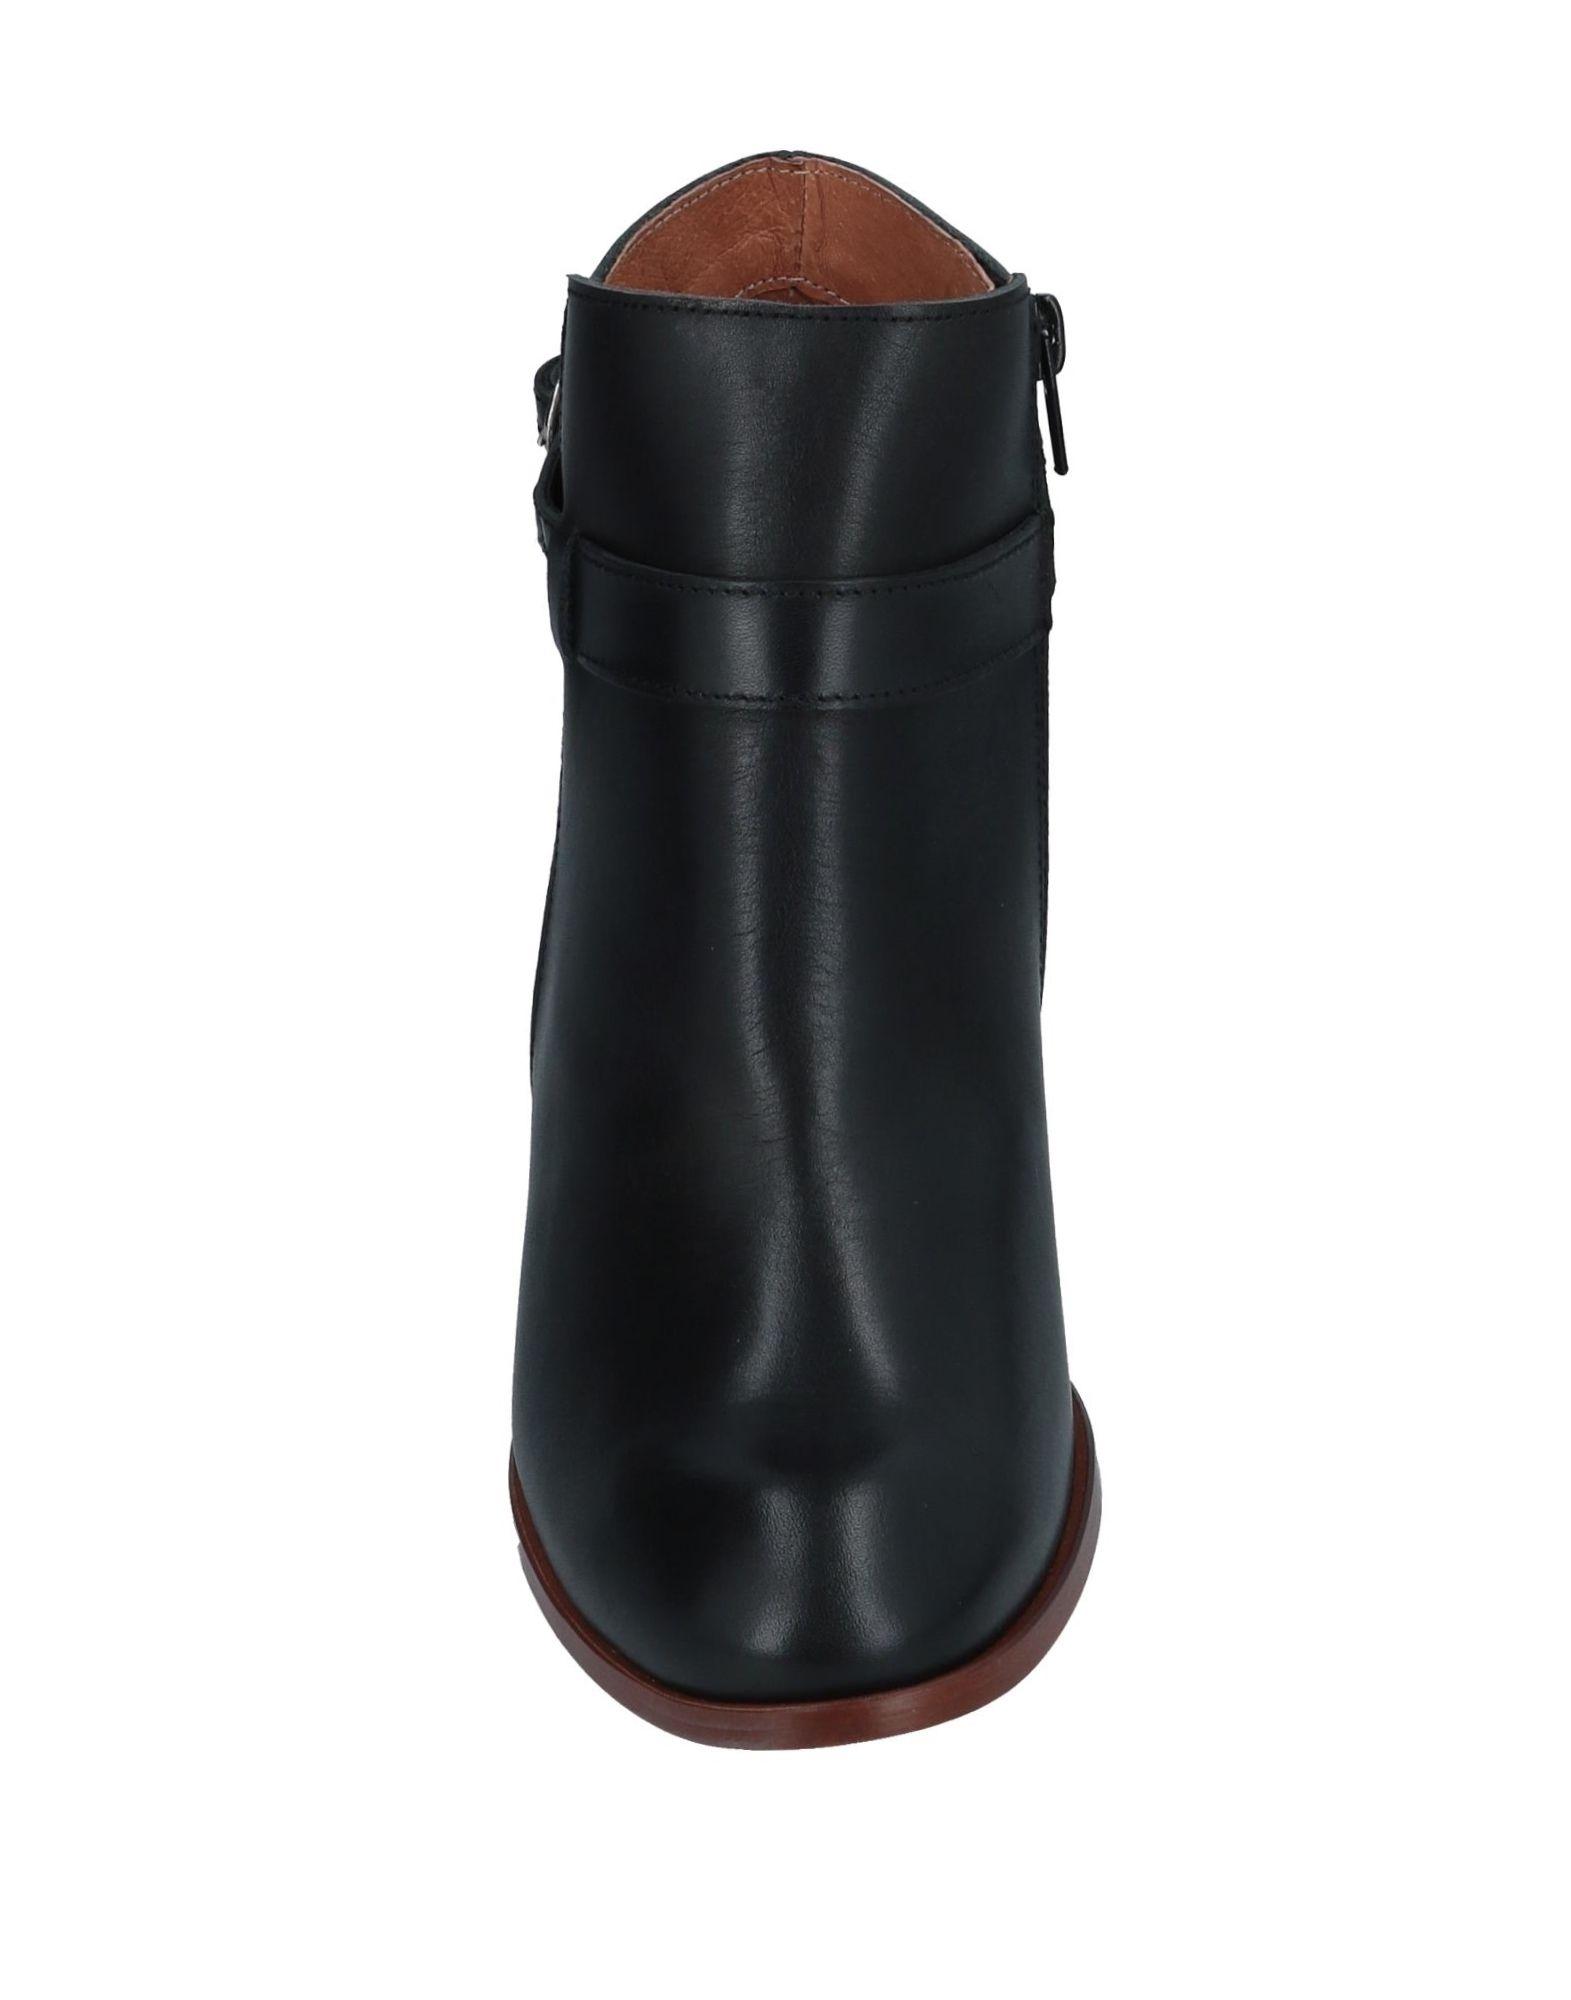 Stilvolle billige Schuhe 11548394IQ Apologie Stiefelette Damen  11548394IQ Schuhe 602ef2